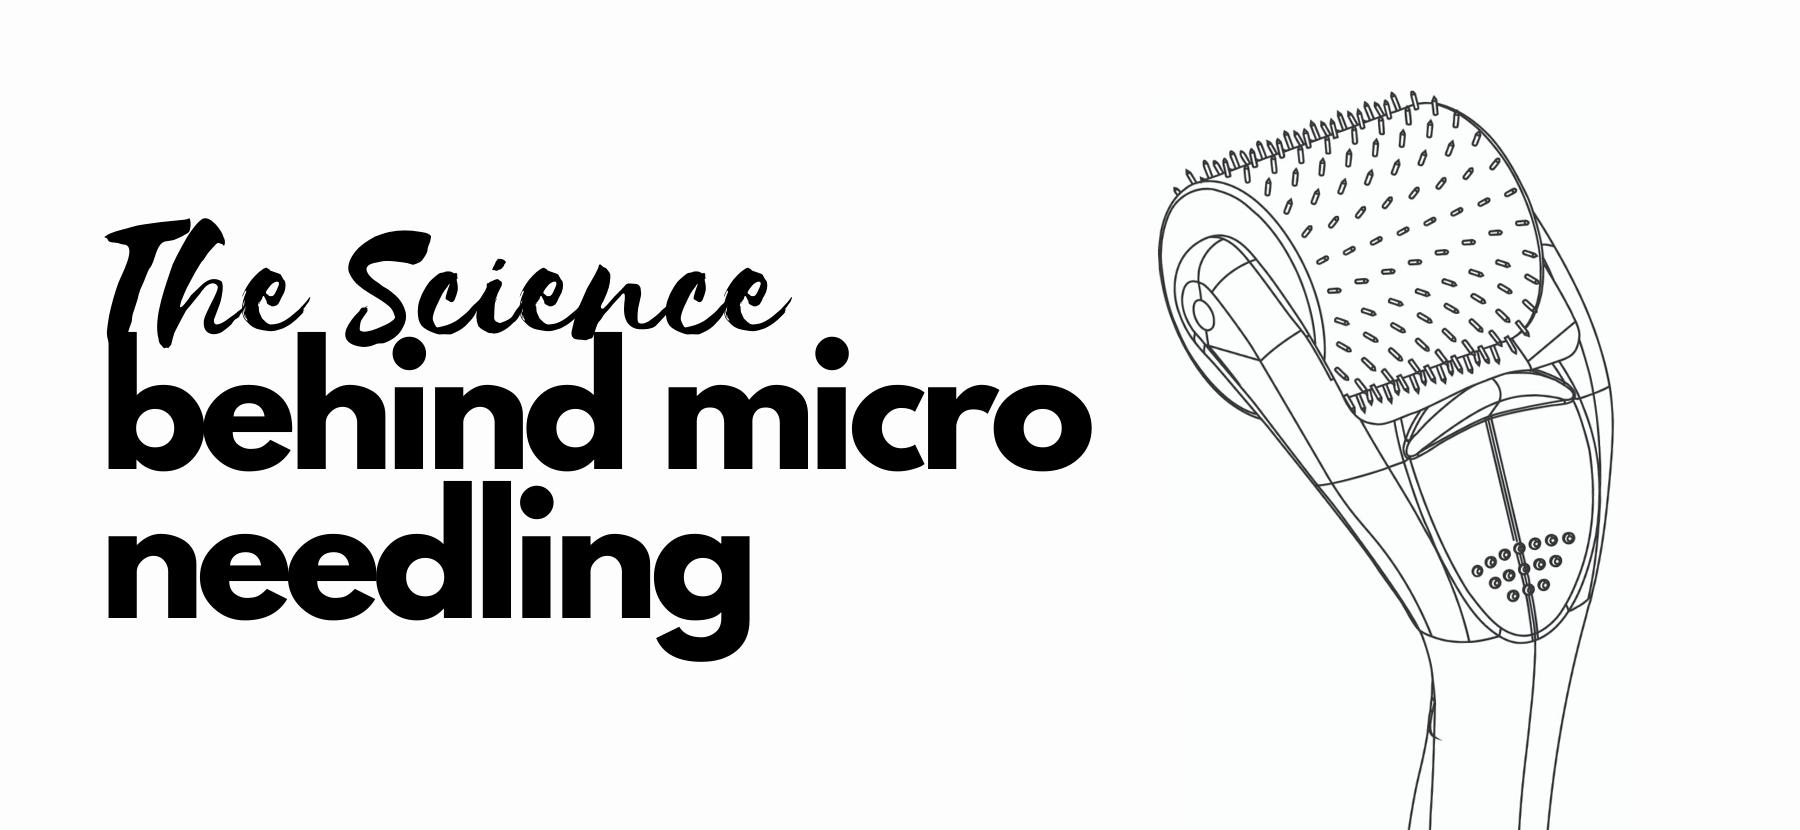 The Science Behind Micro Needling